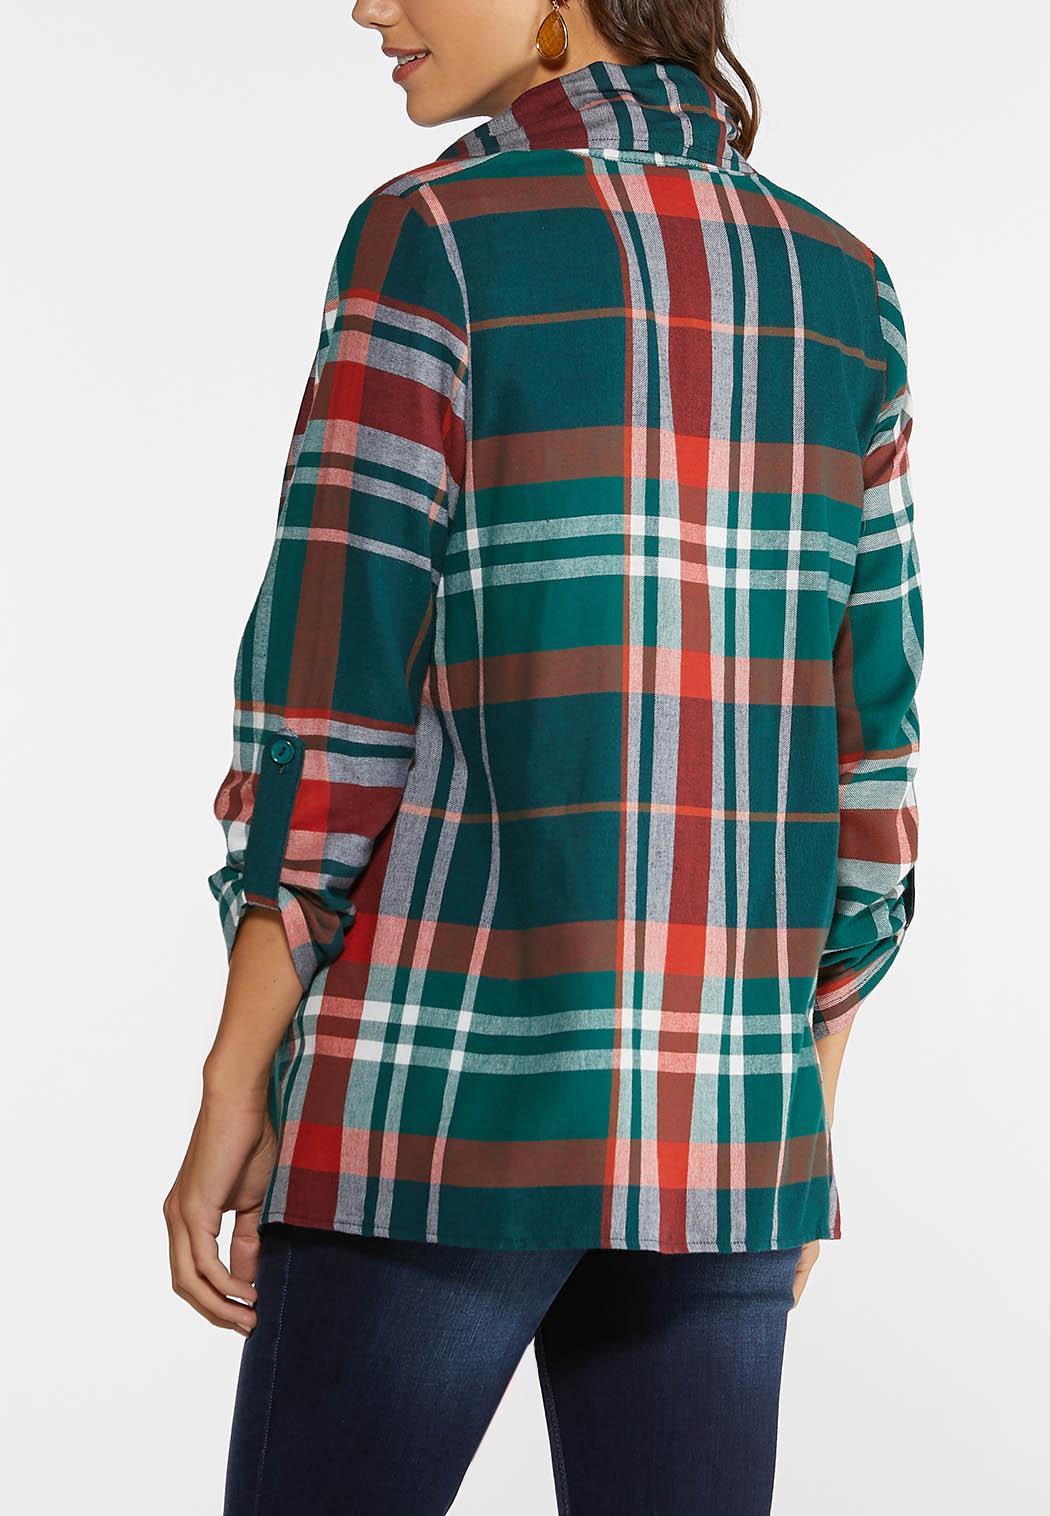 Autumn Green Plaid Jacket (Item #43993656)